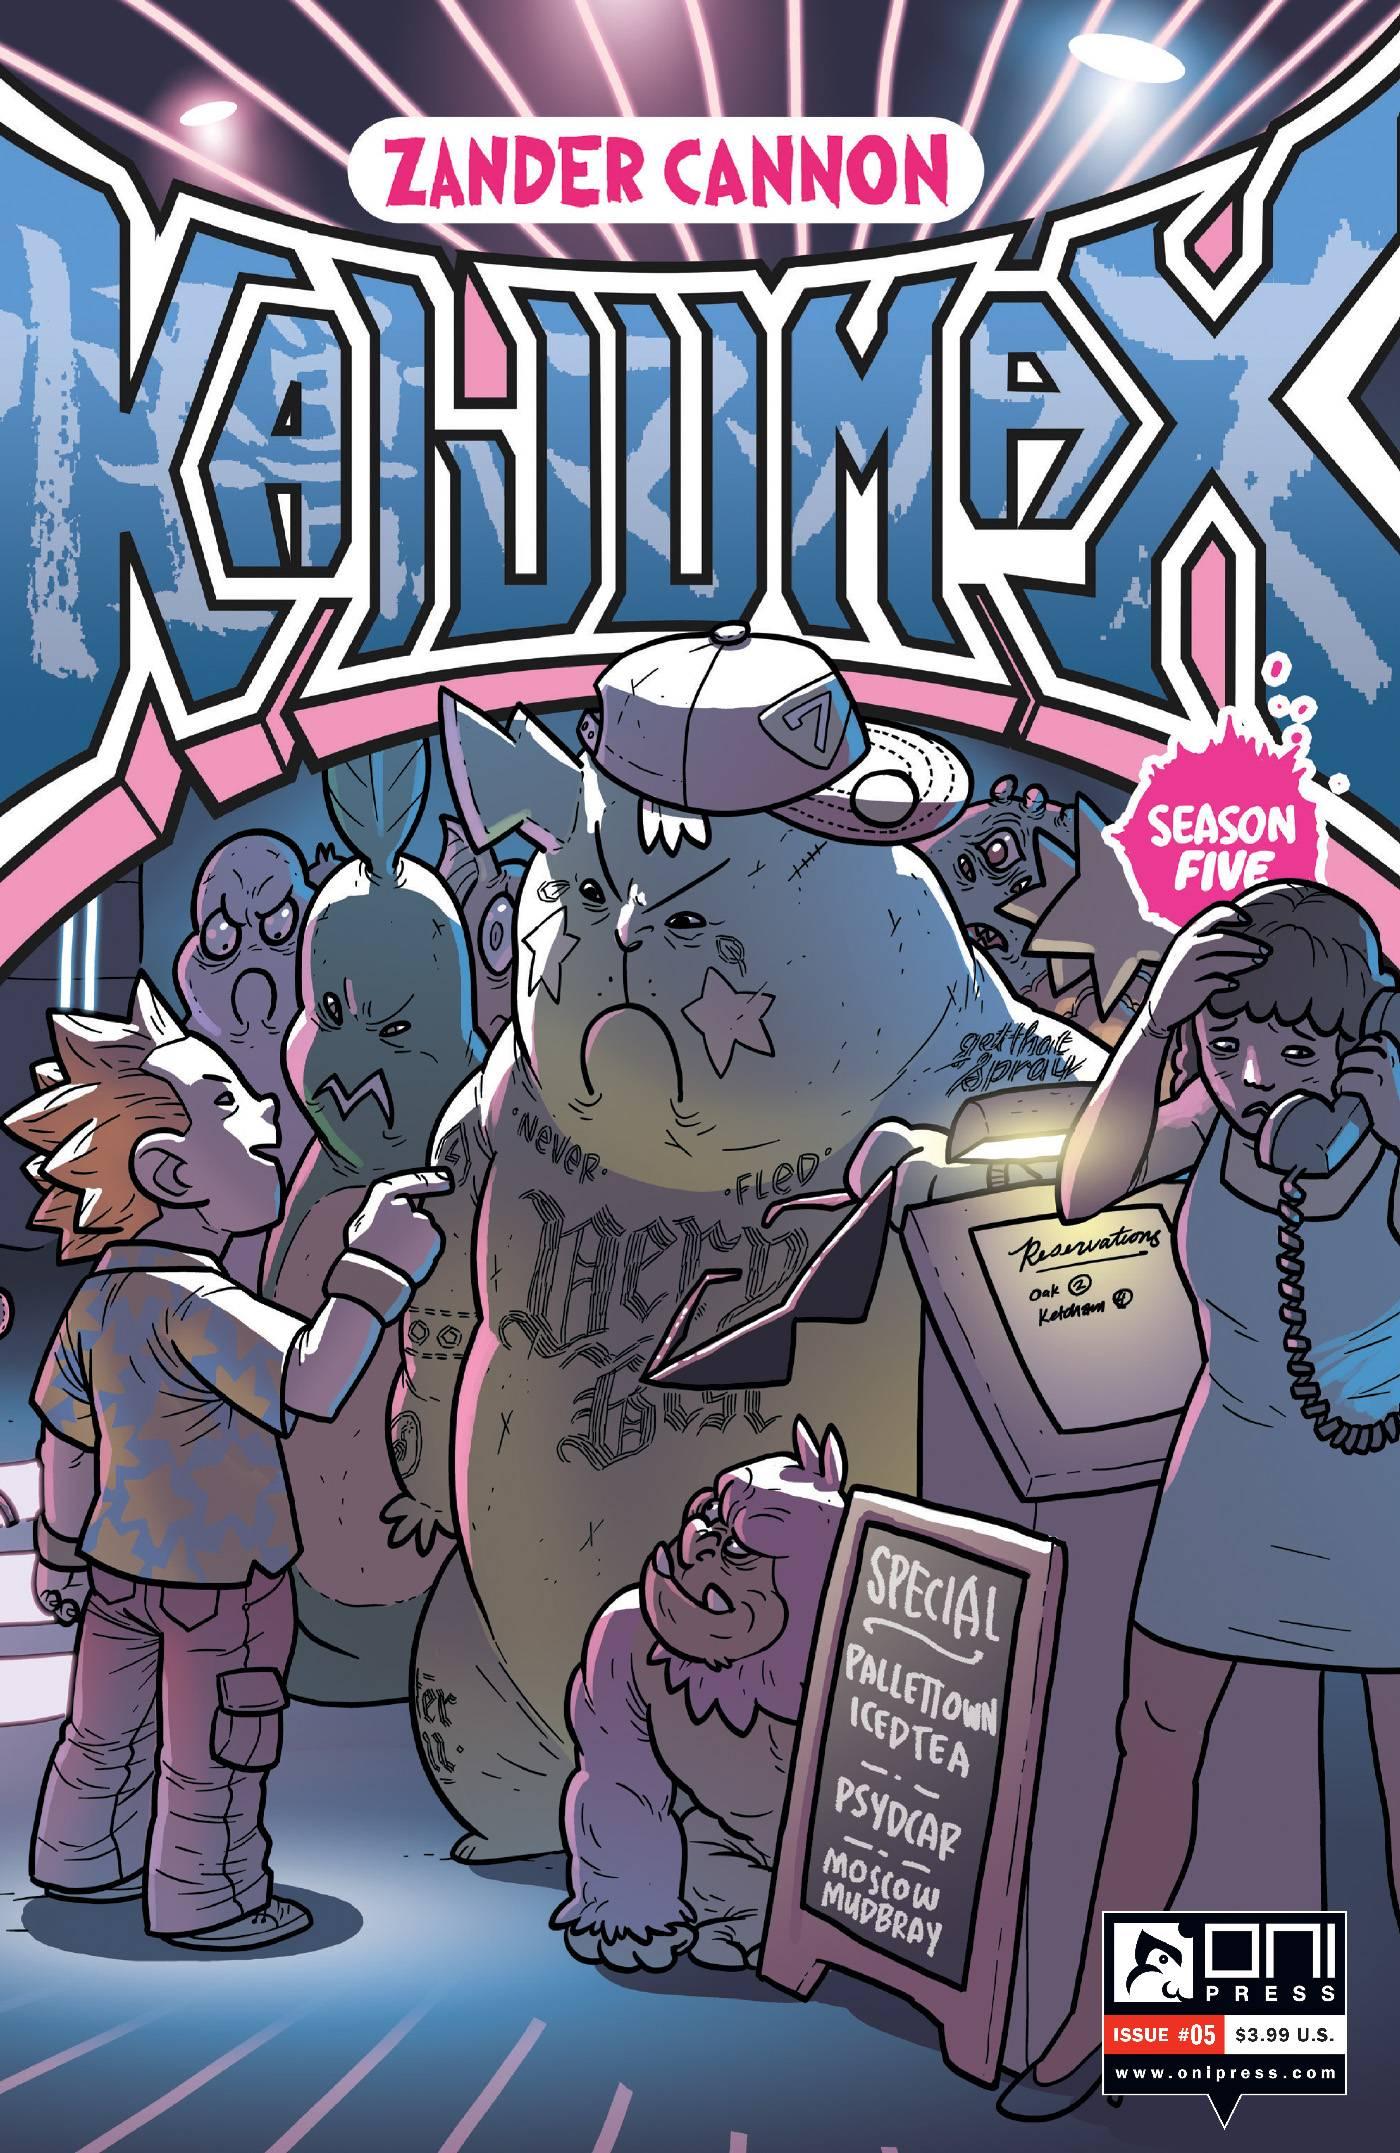 Kaijumax Season 5 #5 (2020)